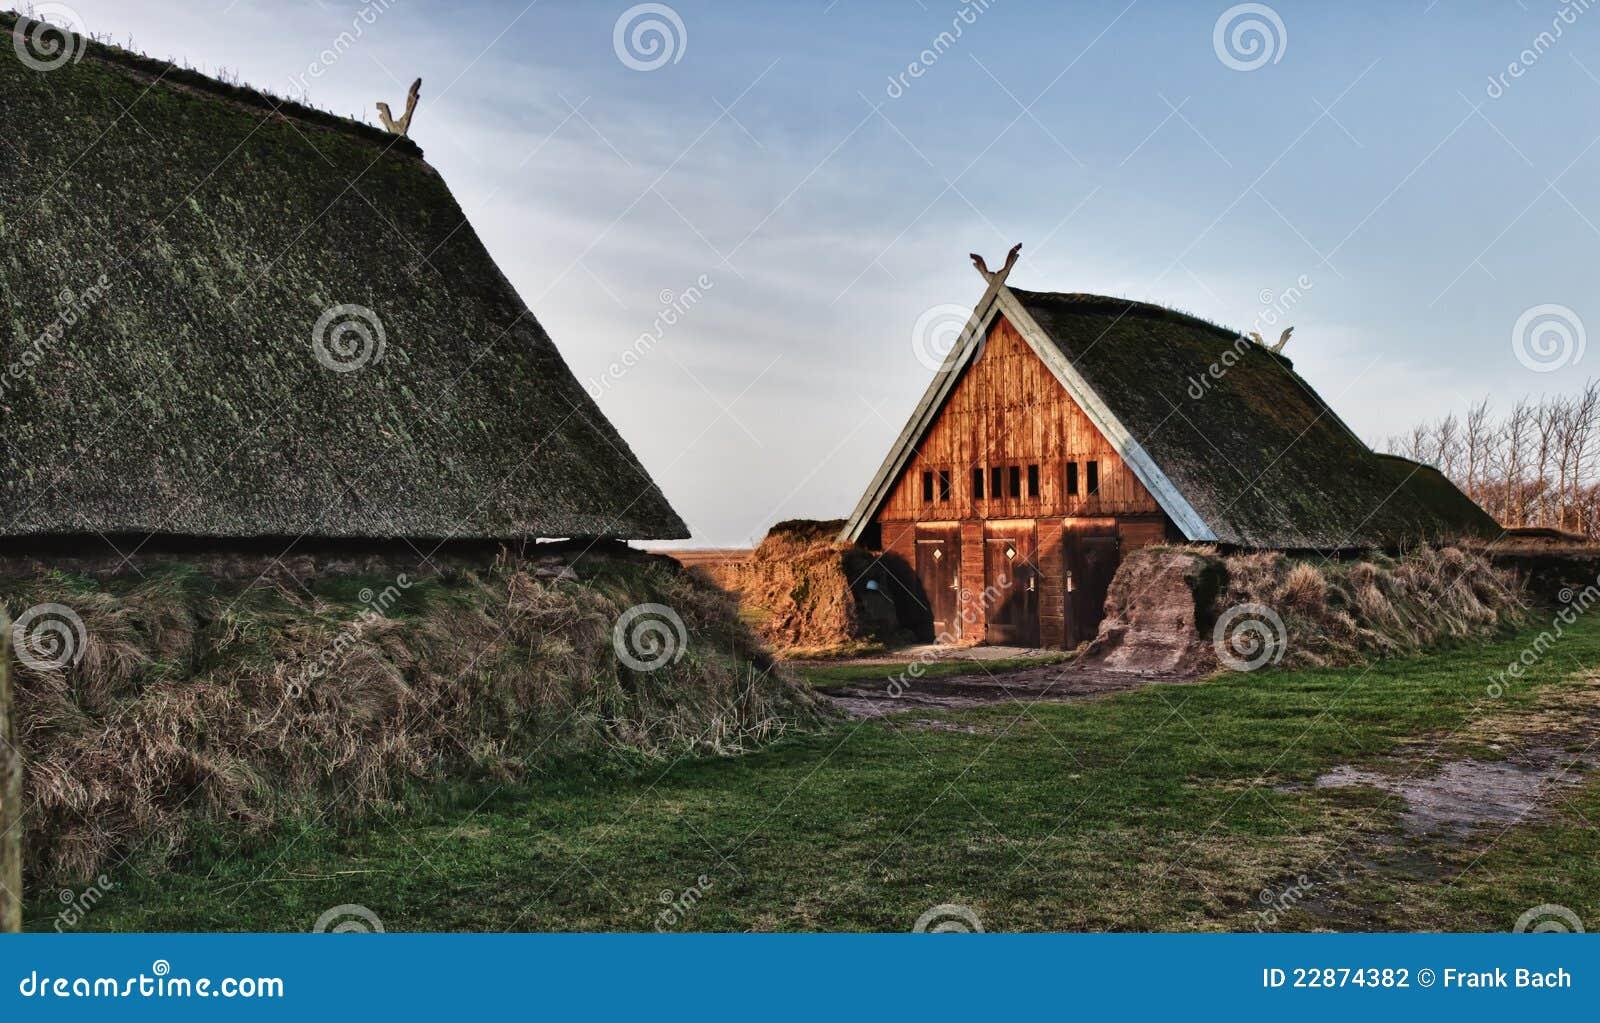 Traditional Old Viking Age House Stock Photo Image 22874382